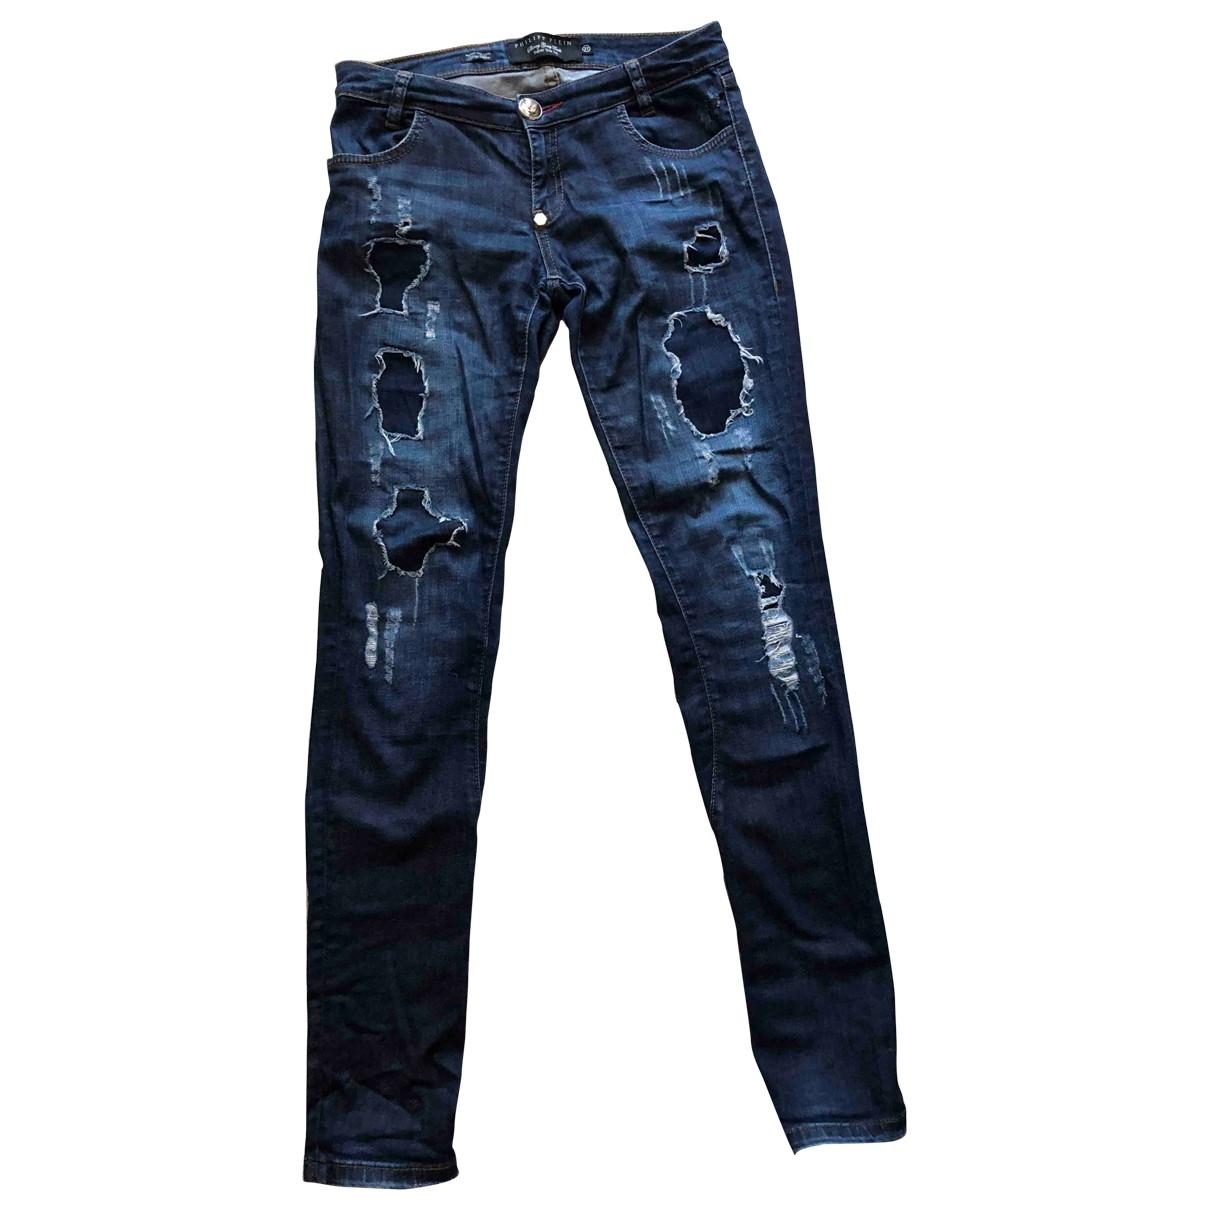 Philipp Plein \N Blue Denim - Jeans Jeans for Women 27 US